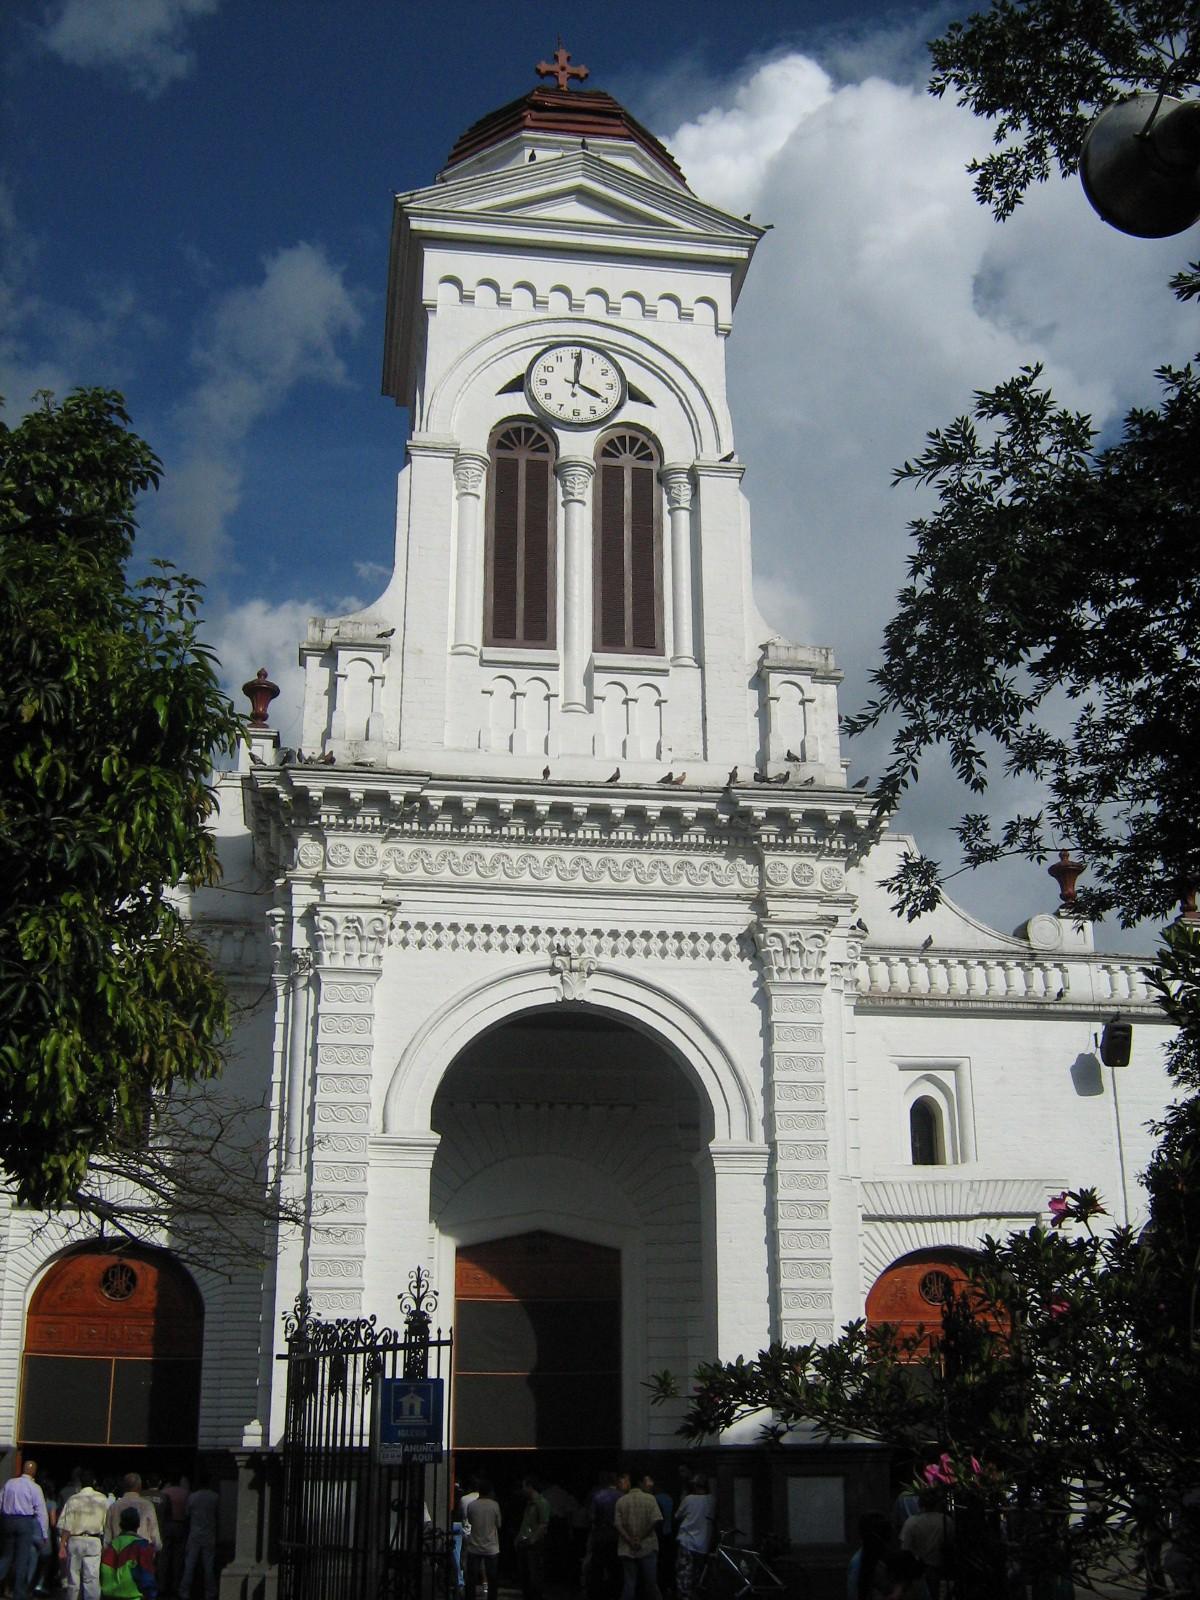 Historia de la colombiana - 3 part 2